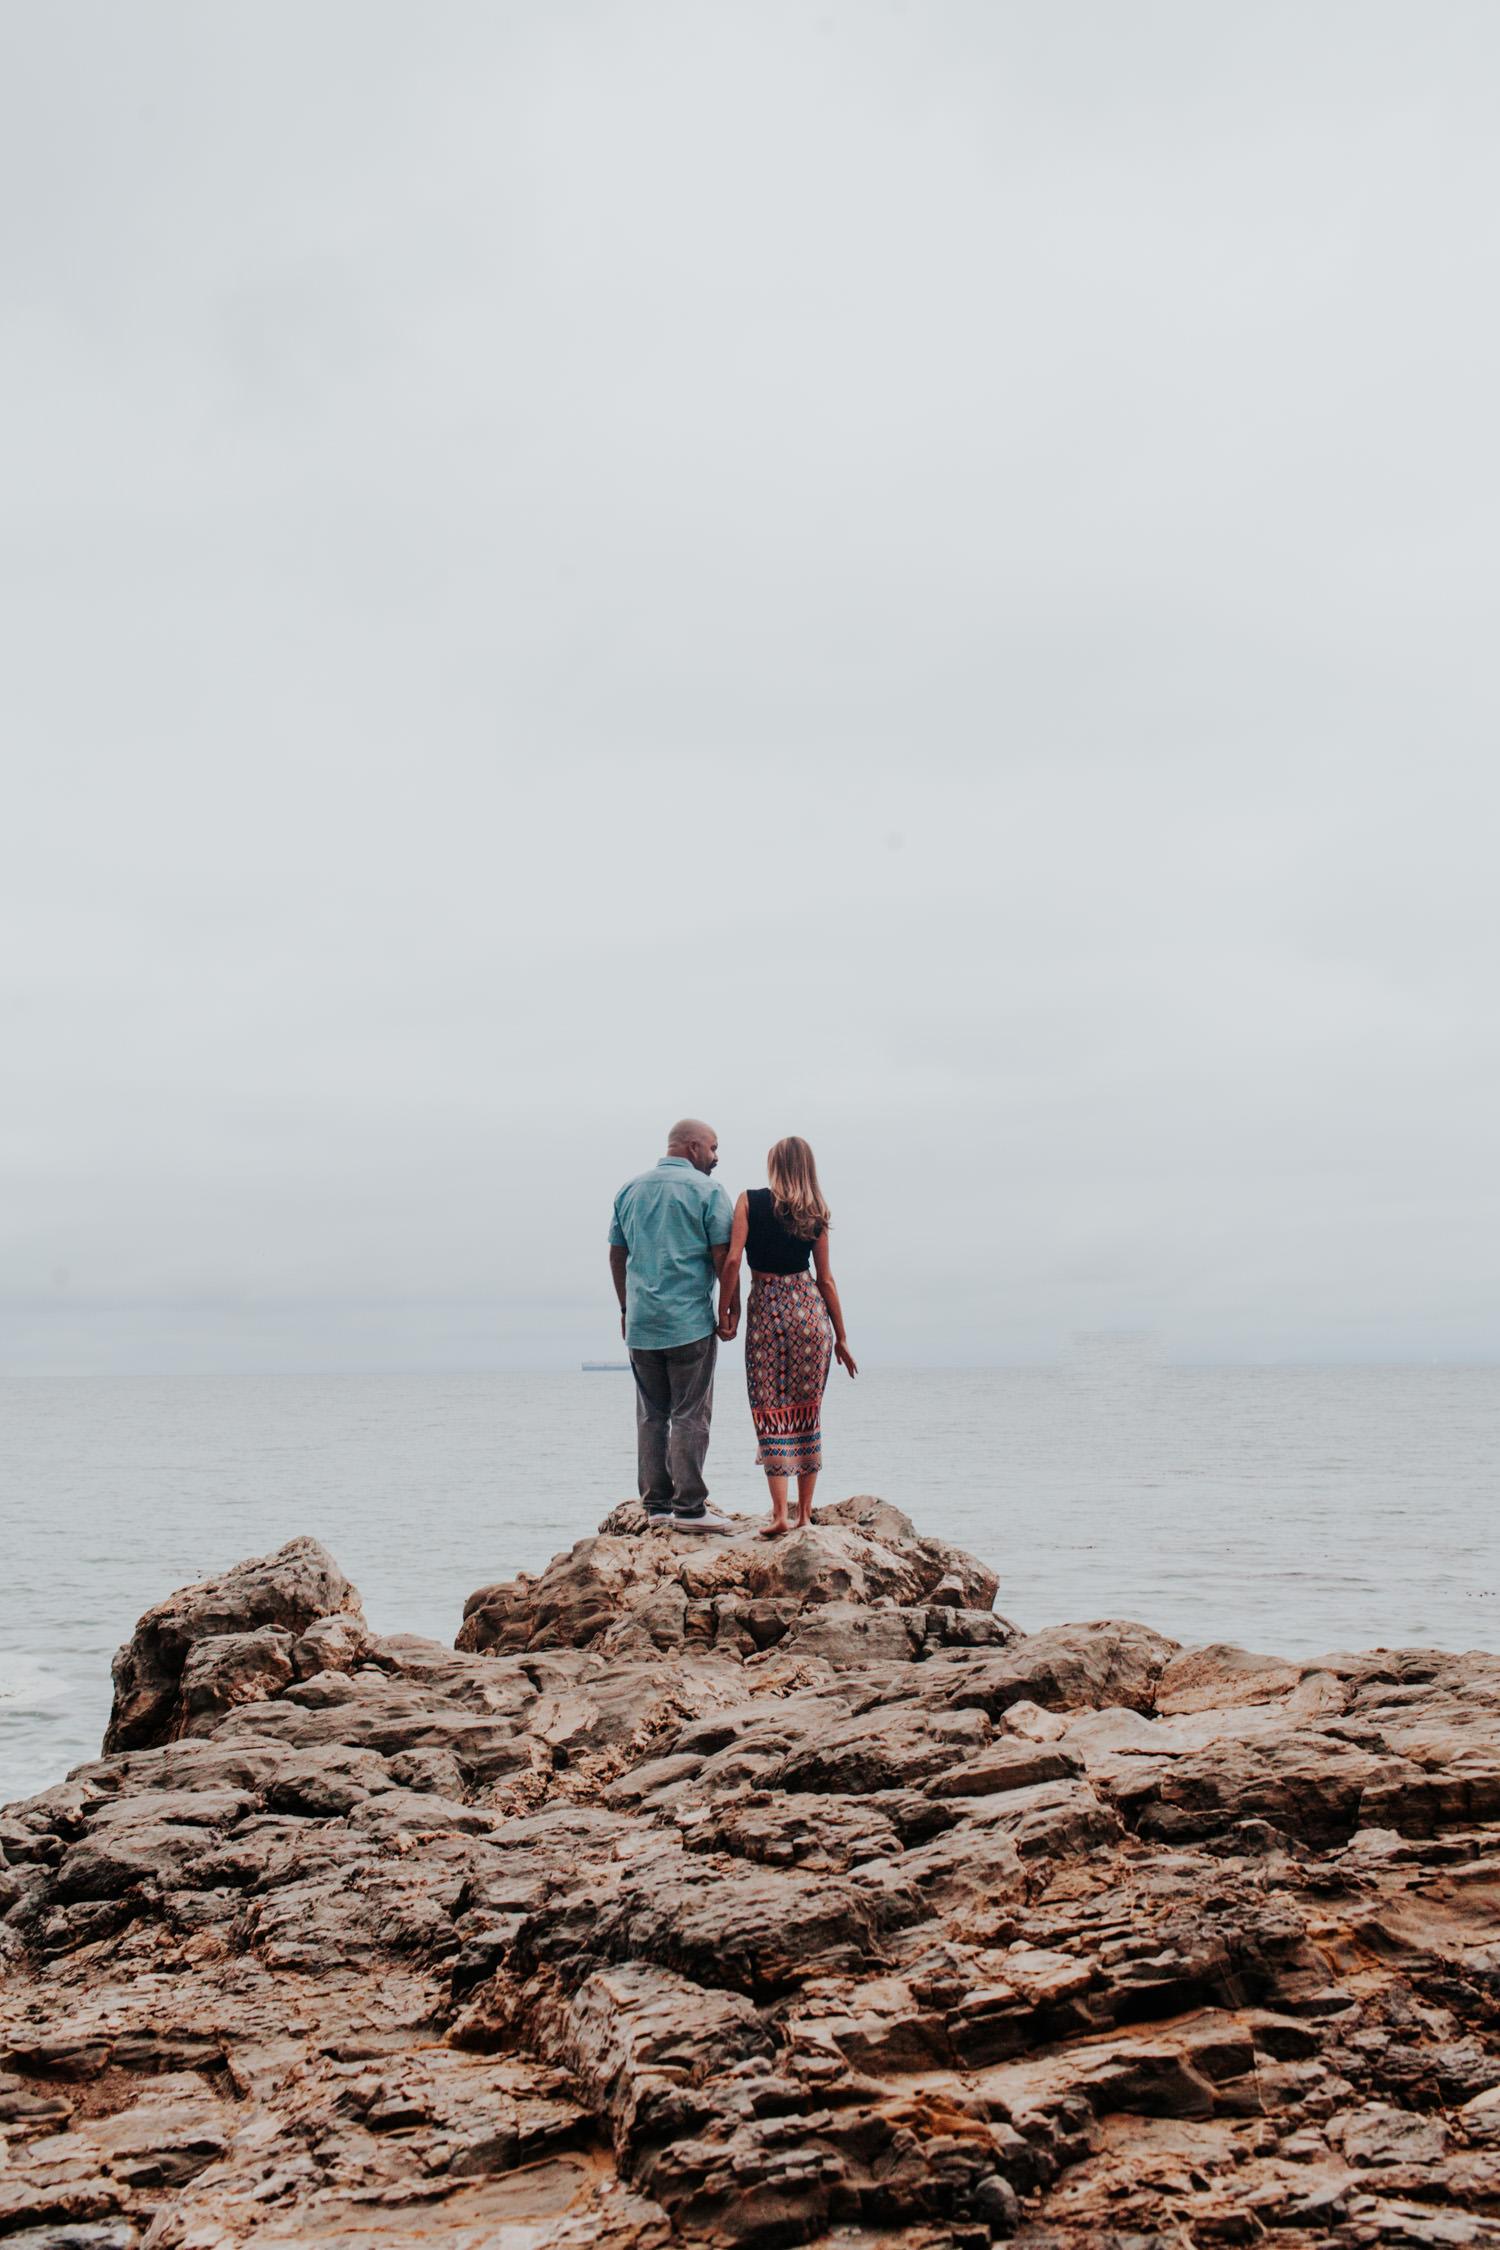 terranea-resort-palos-verdes-california-wedding-photography-cove-los-angeles-pierce-97.jpg